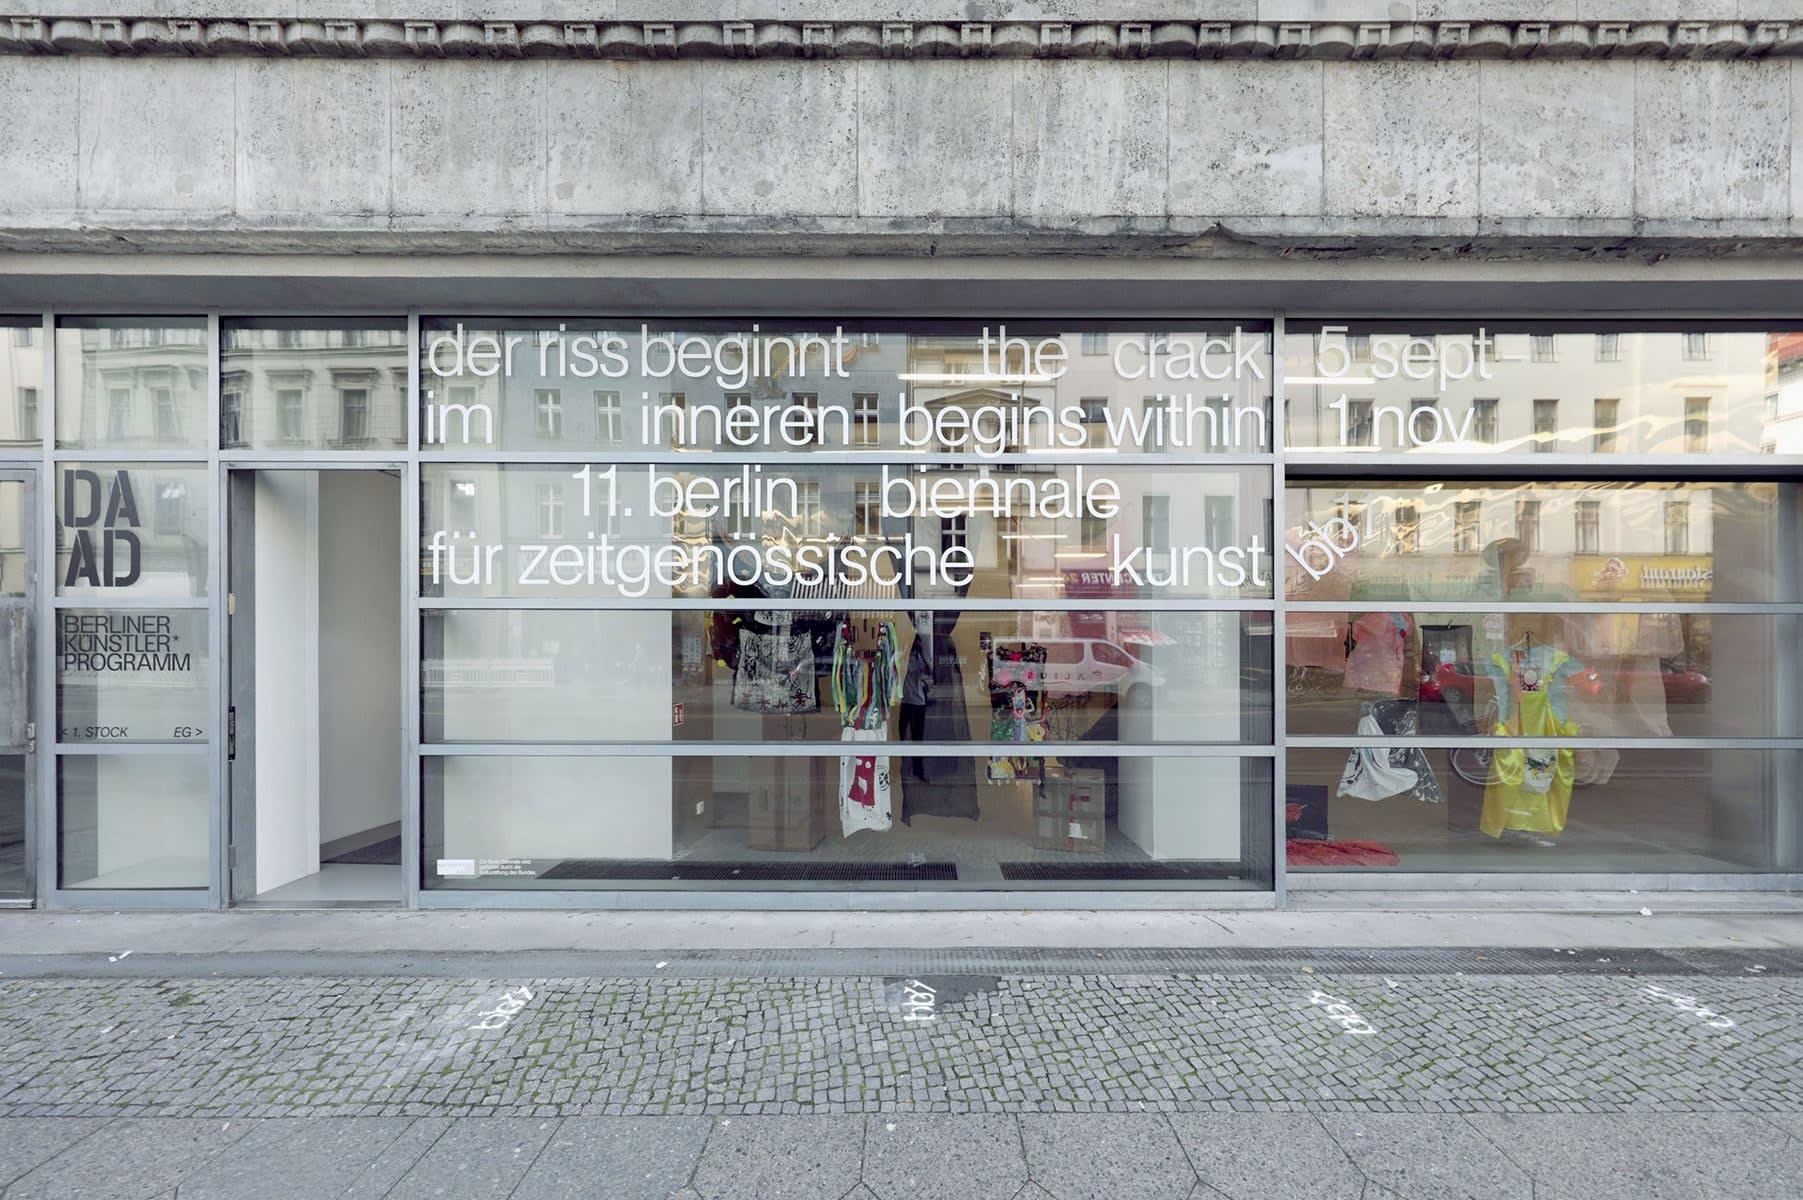 daad gallery, berlin